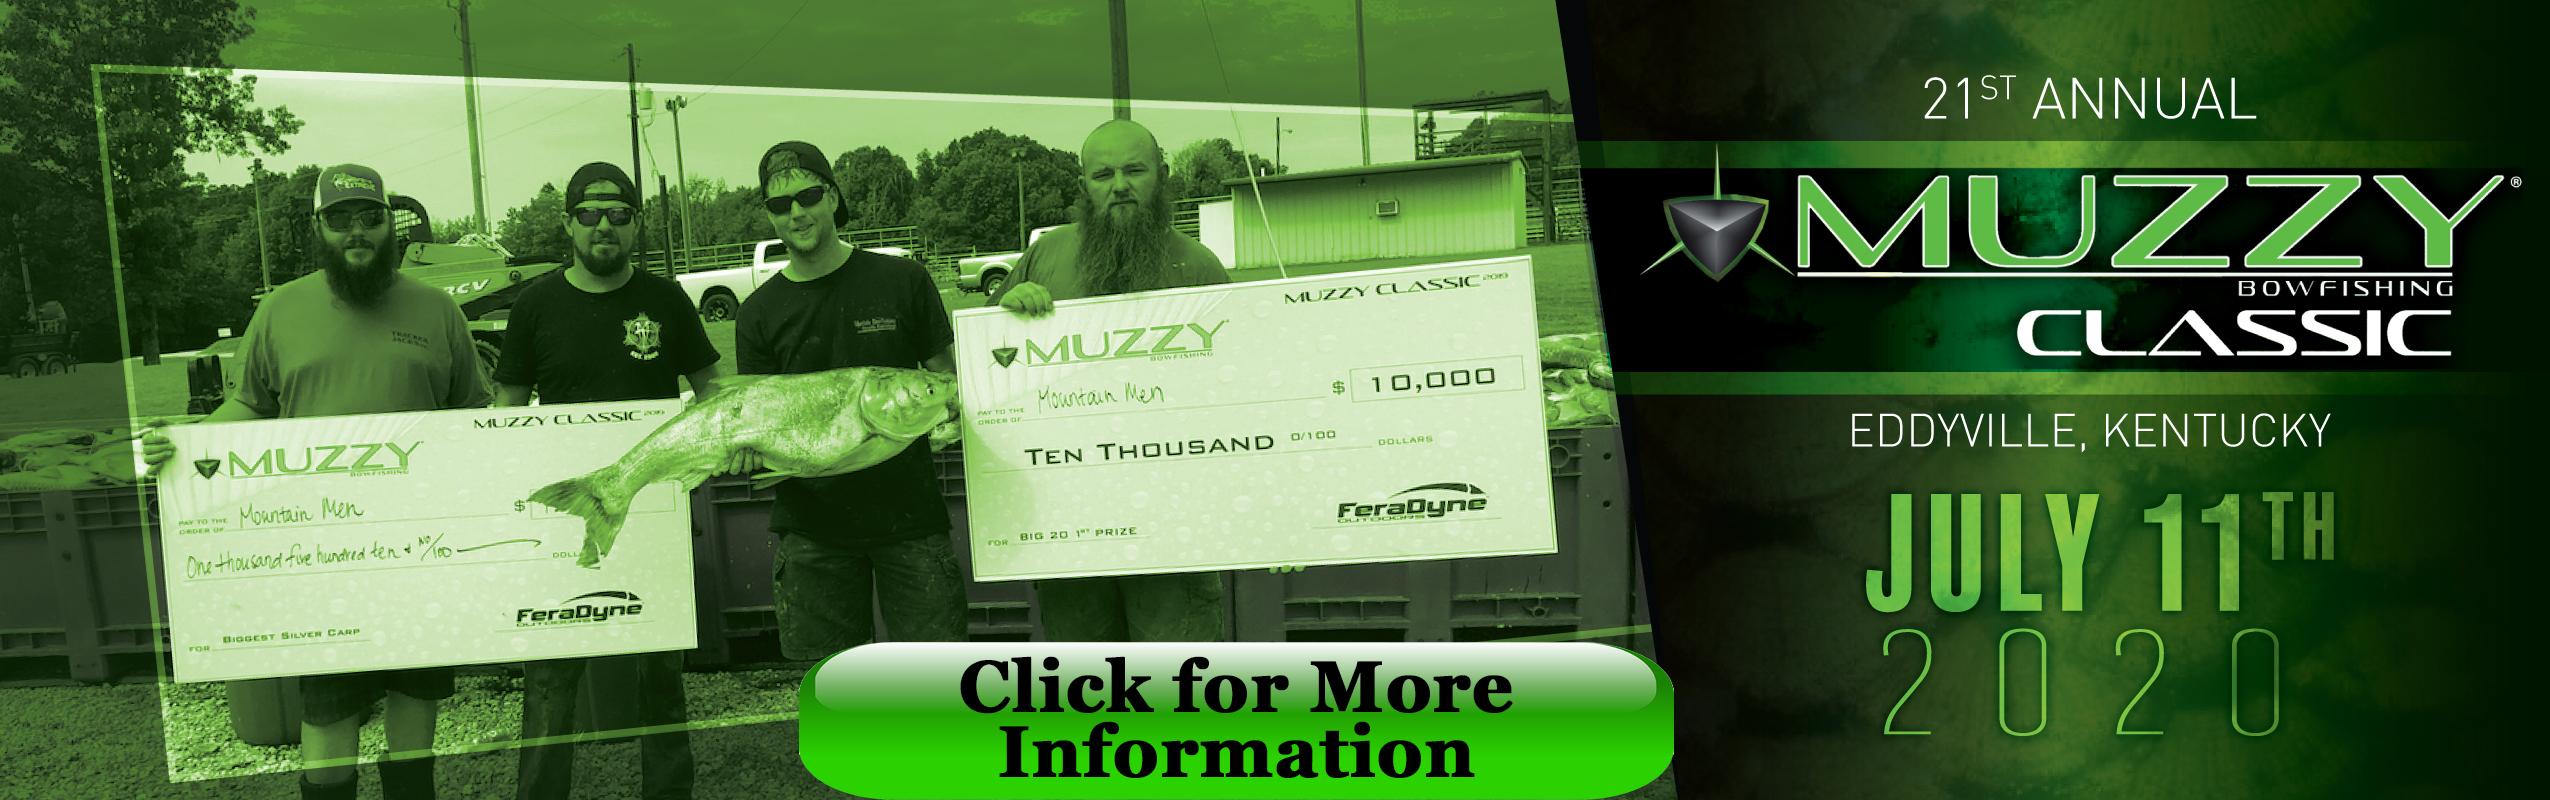 muzzycover2020-web.png